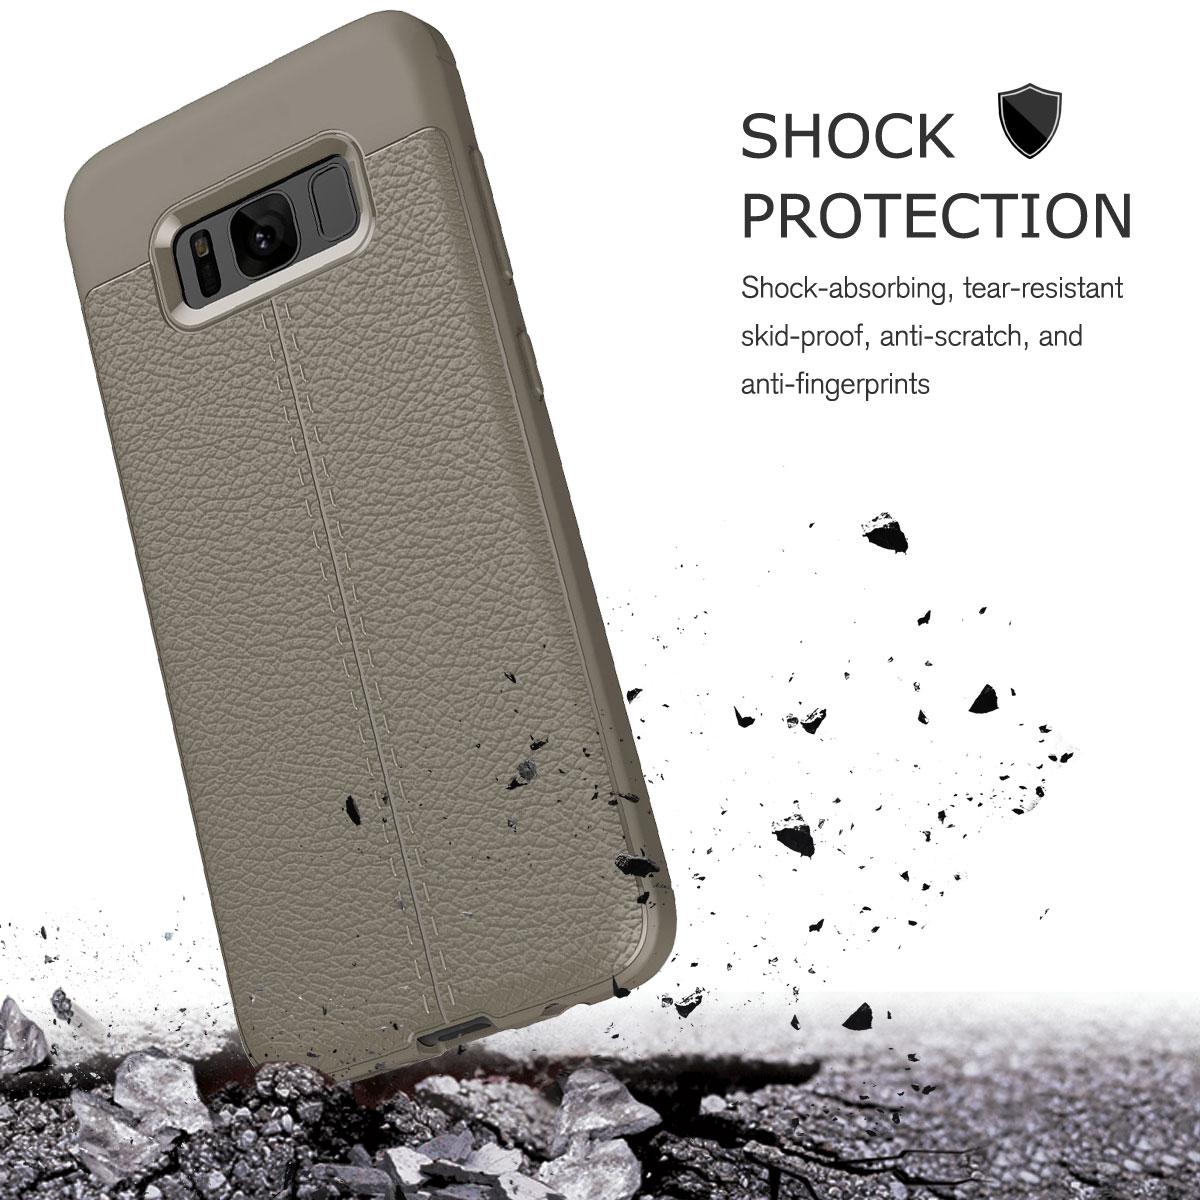 Thin Rubber Shockproof Rugged Soft Case For Samsung Galaxy J7 J5 J3 Softcase Droff Matte Black Prime Product Details